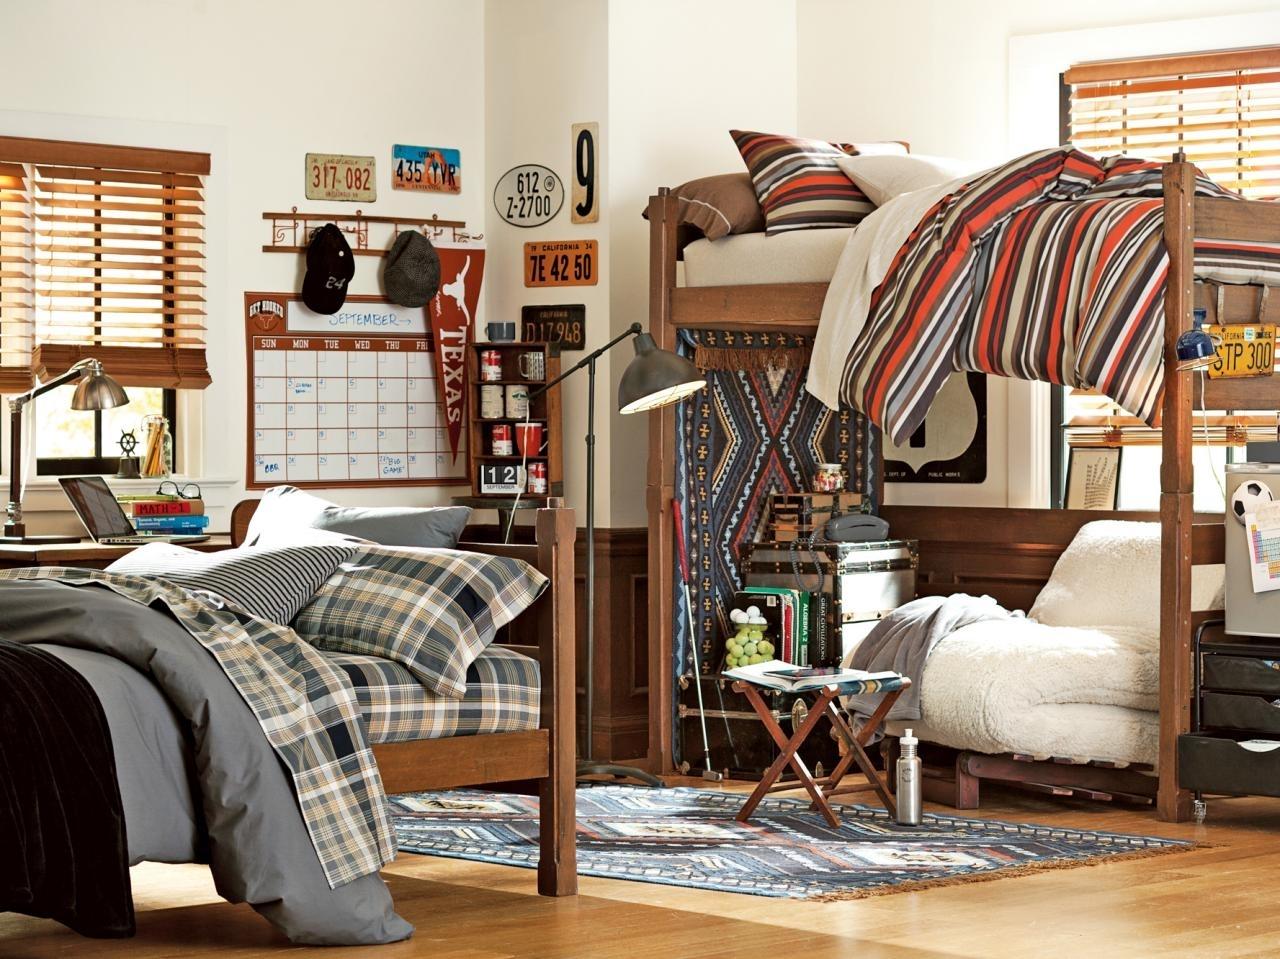 10 Gorgeous Dorm Room Ideas For Guys %name 2020